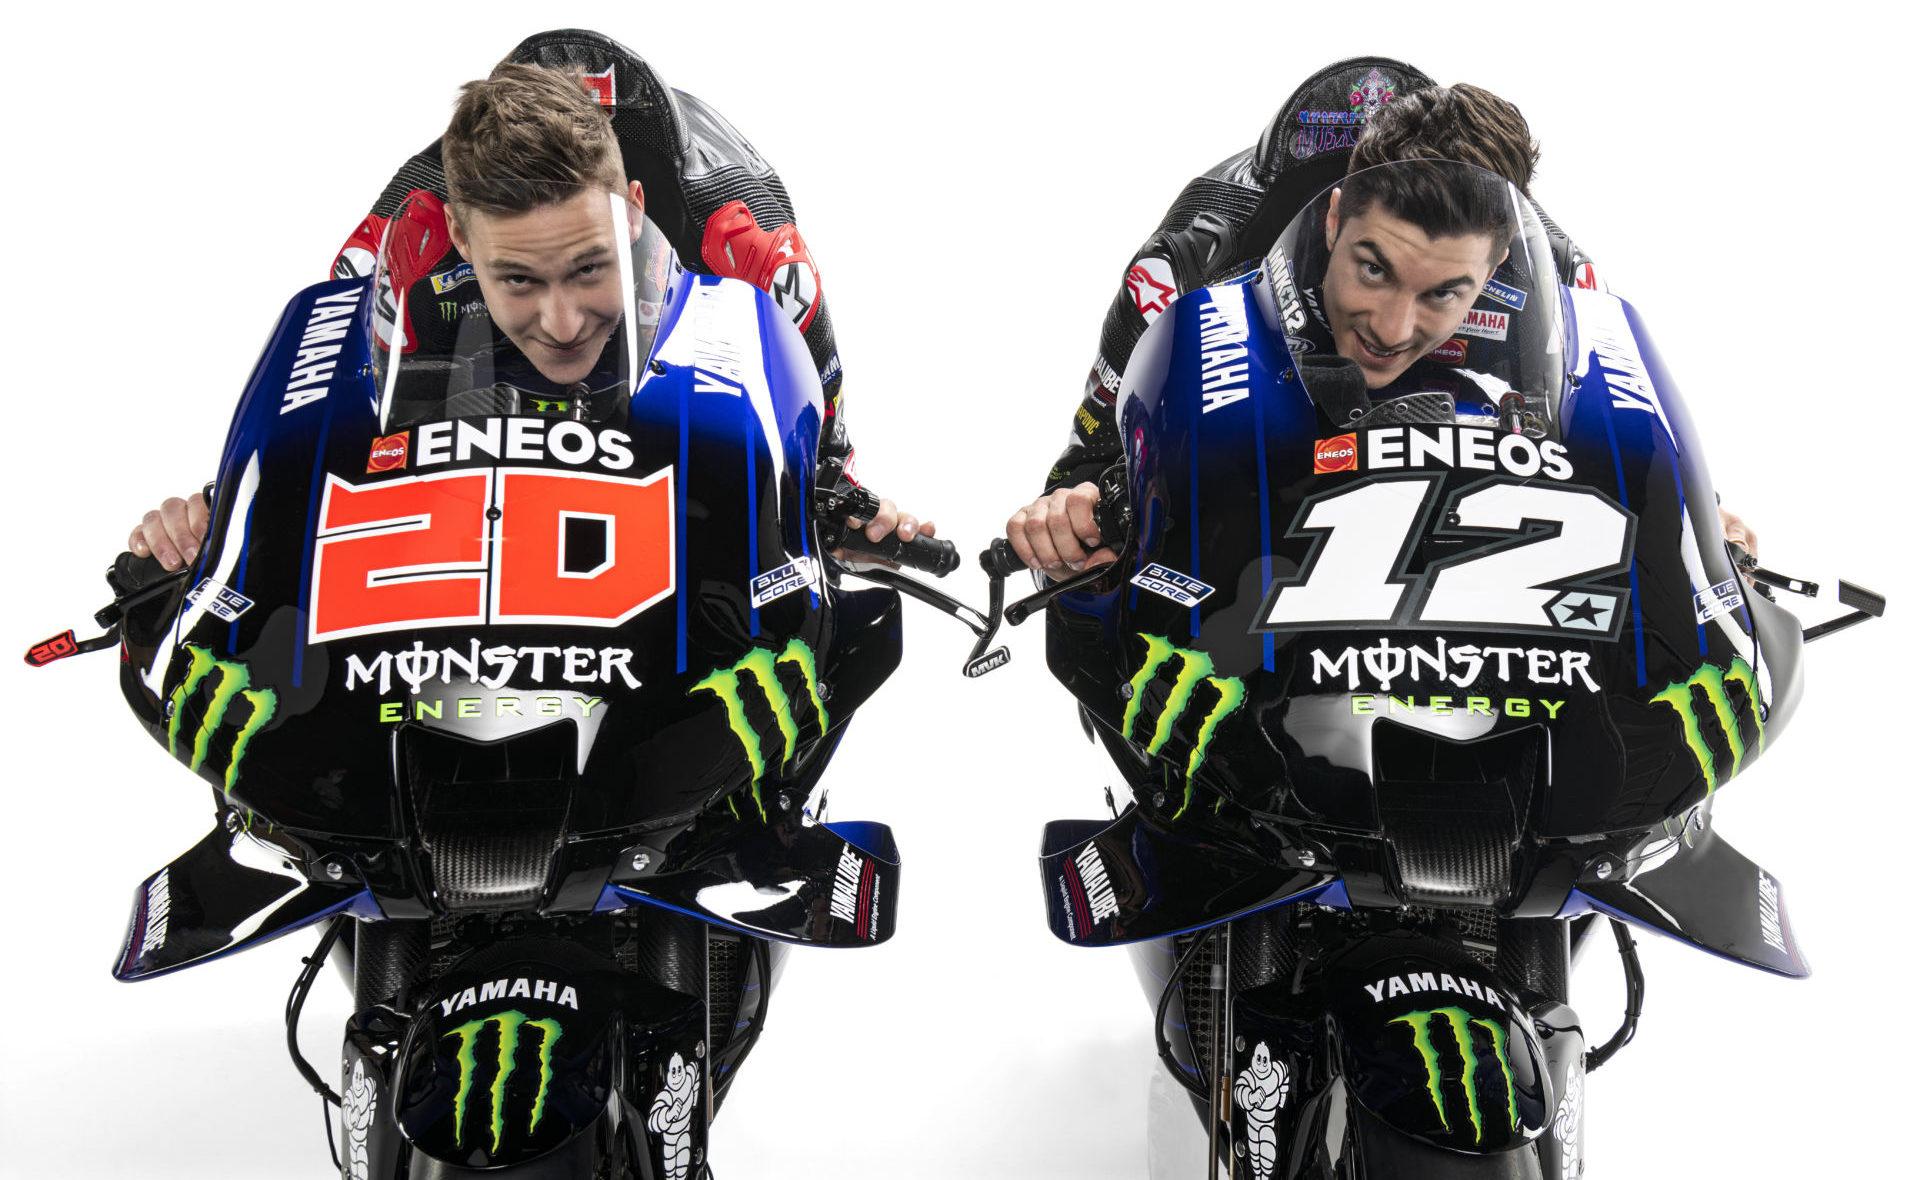 Fabio Quartararo (left) and Maverick Vinales (right). Photo courtesy Monster Energy Yamaha.